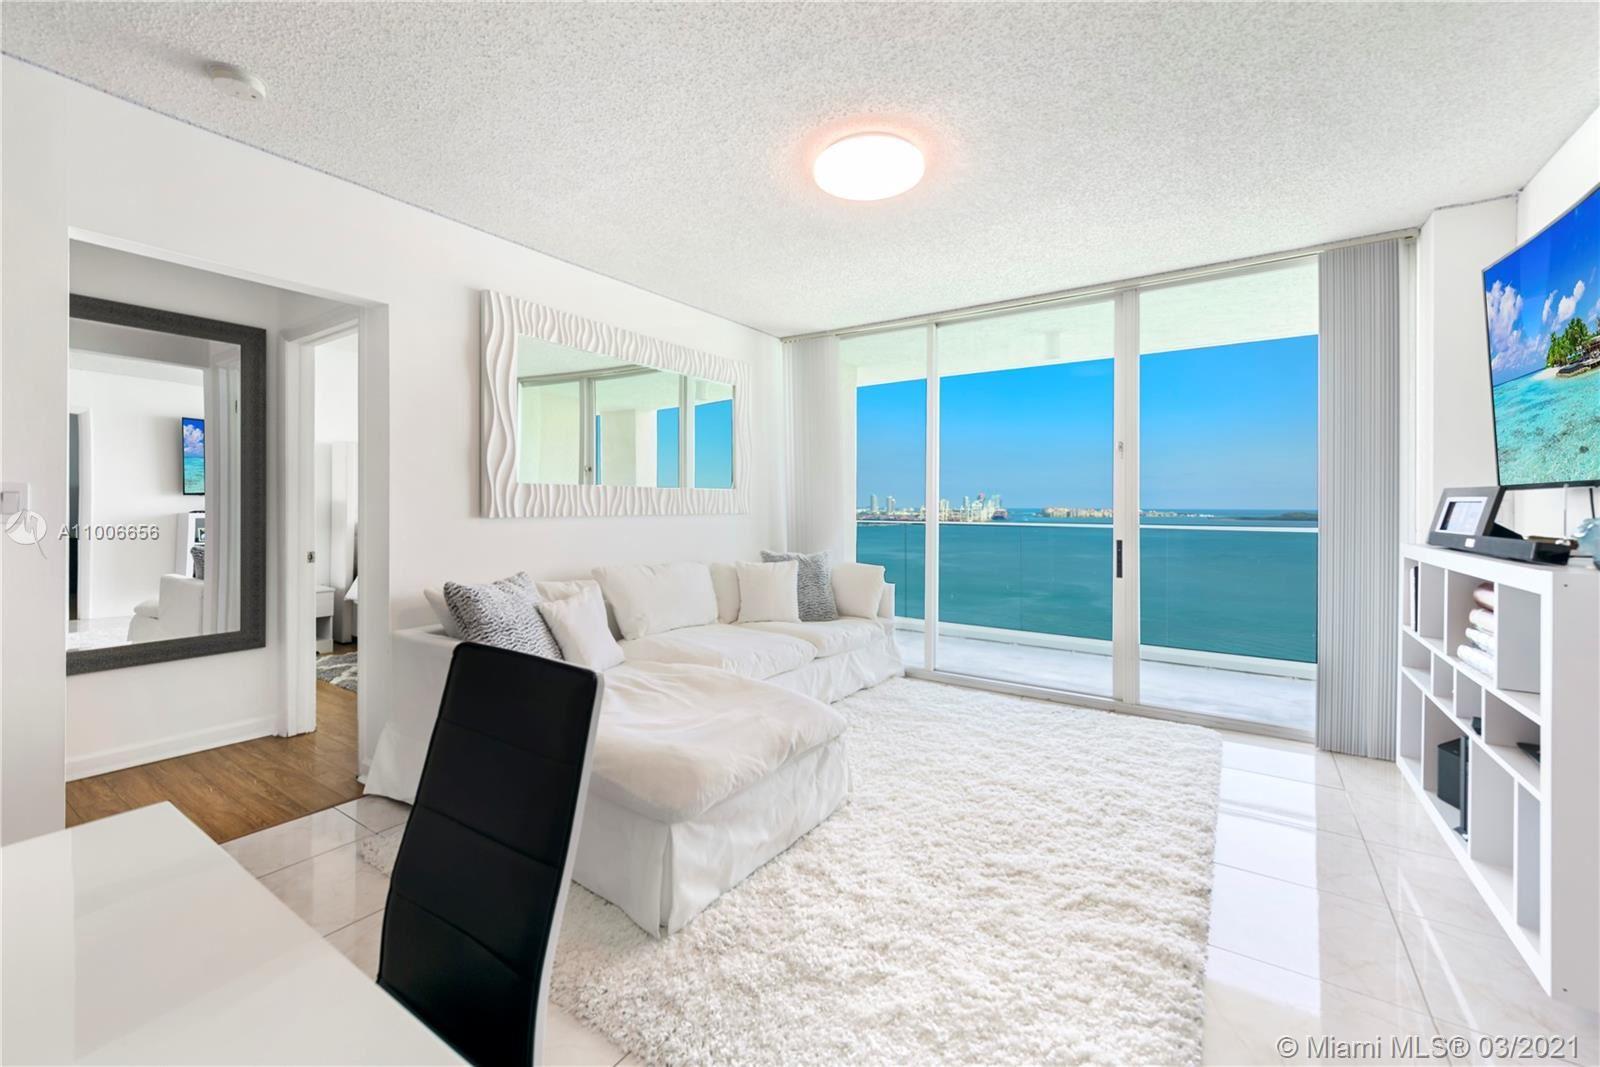 800 Claughton Island Dr #2102, Miami, FL 33131 - #: A11006656